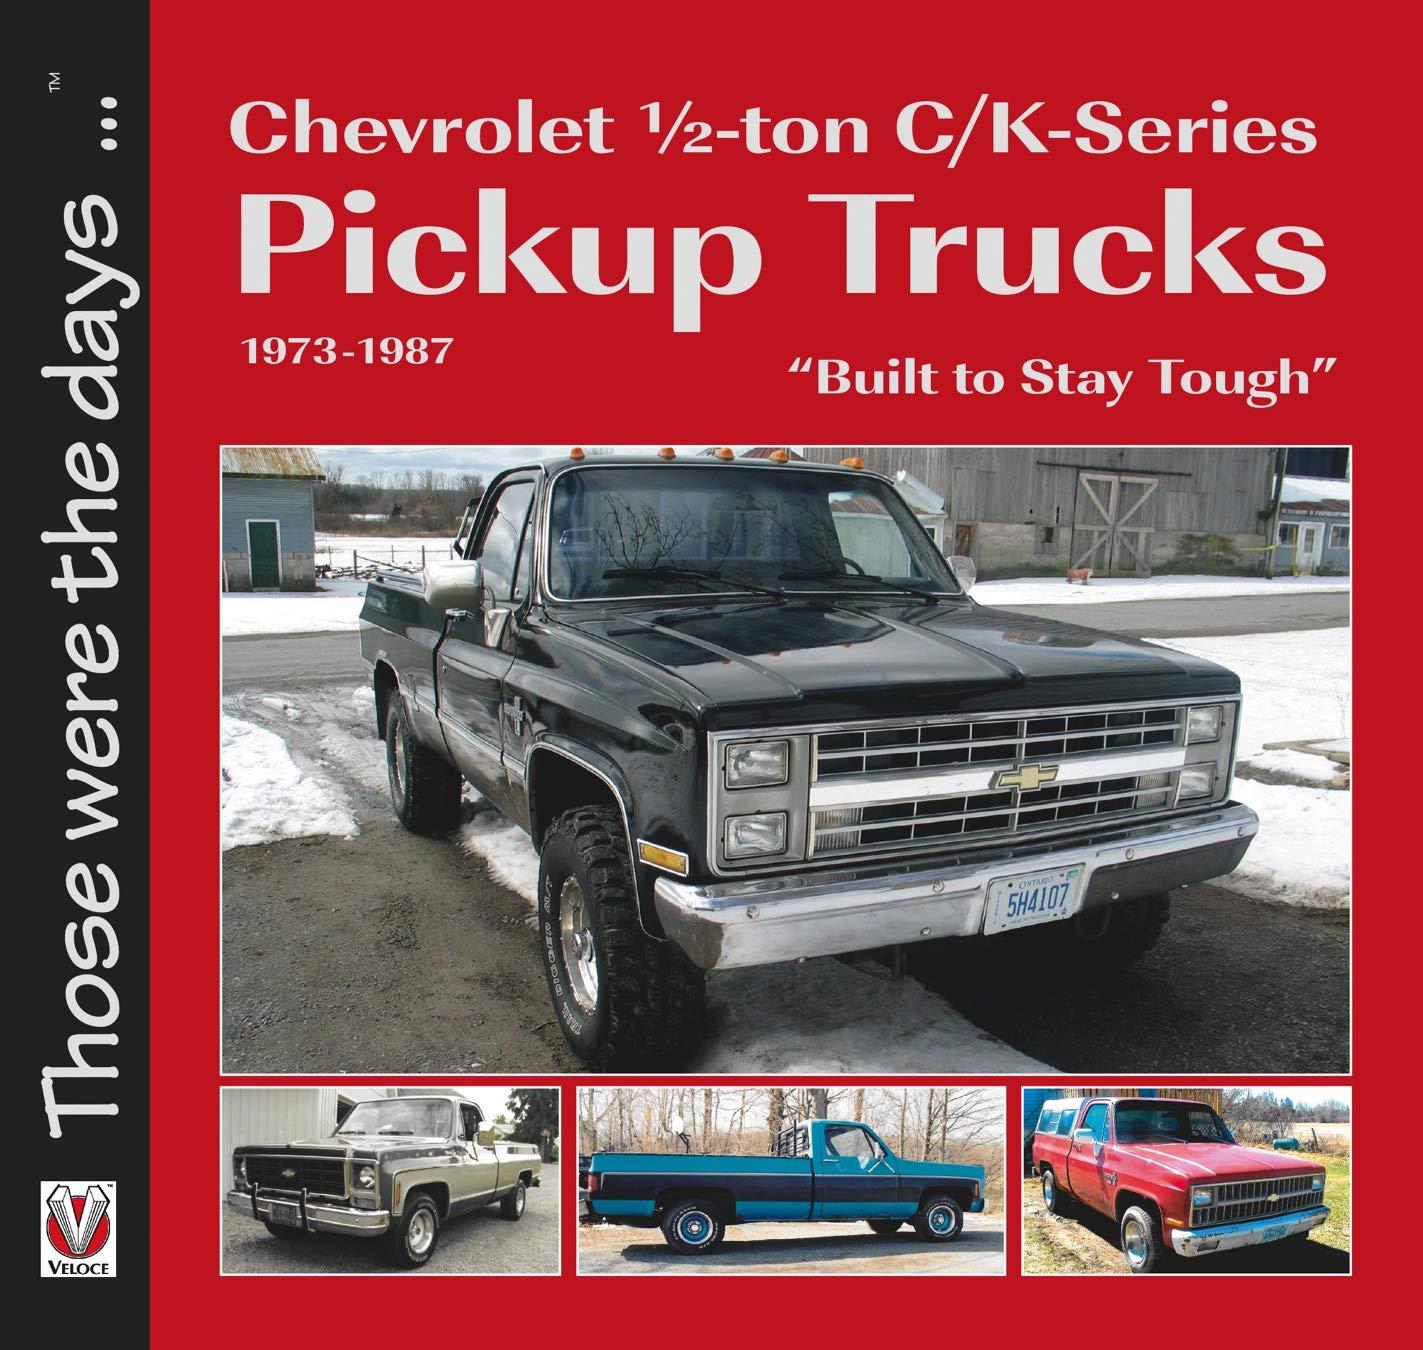 Chevrolet Half-ton C/K-Series Pickup Trucks 1973-1987: Built